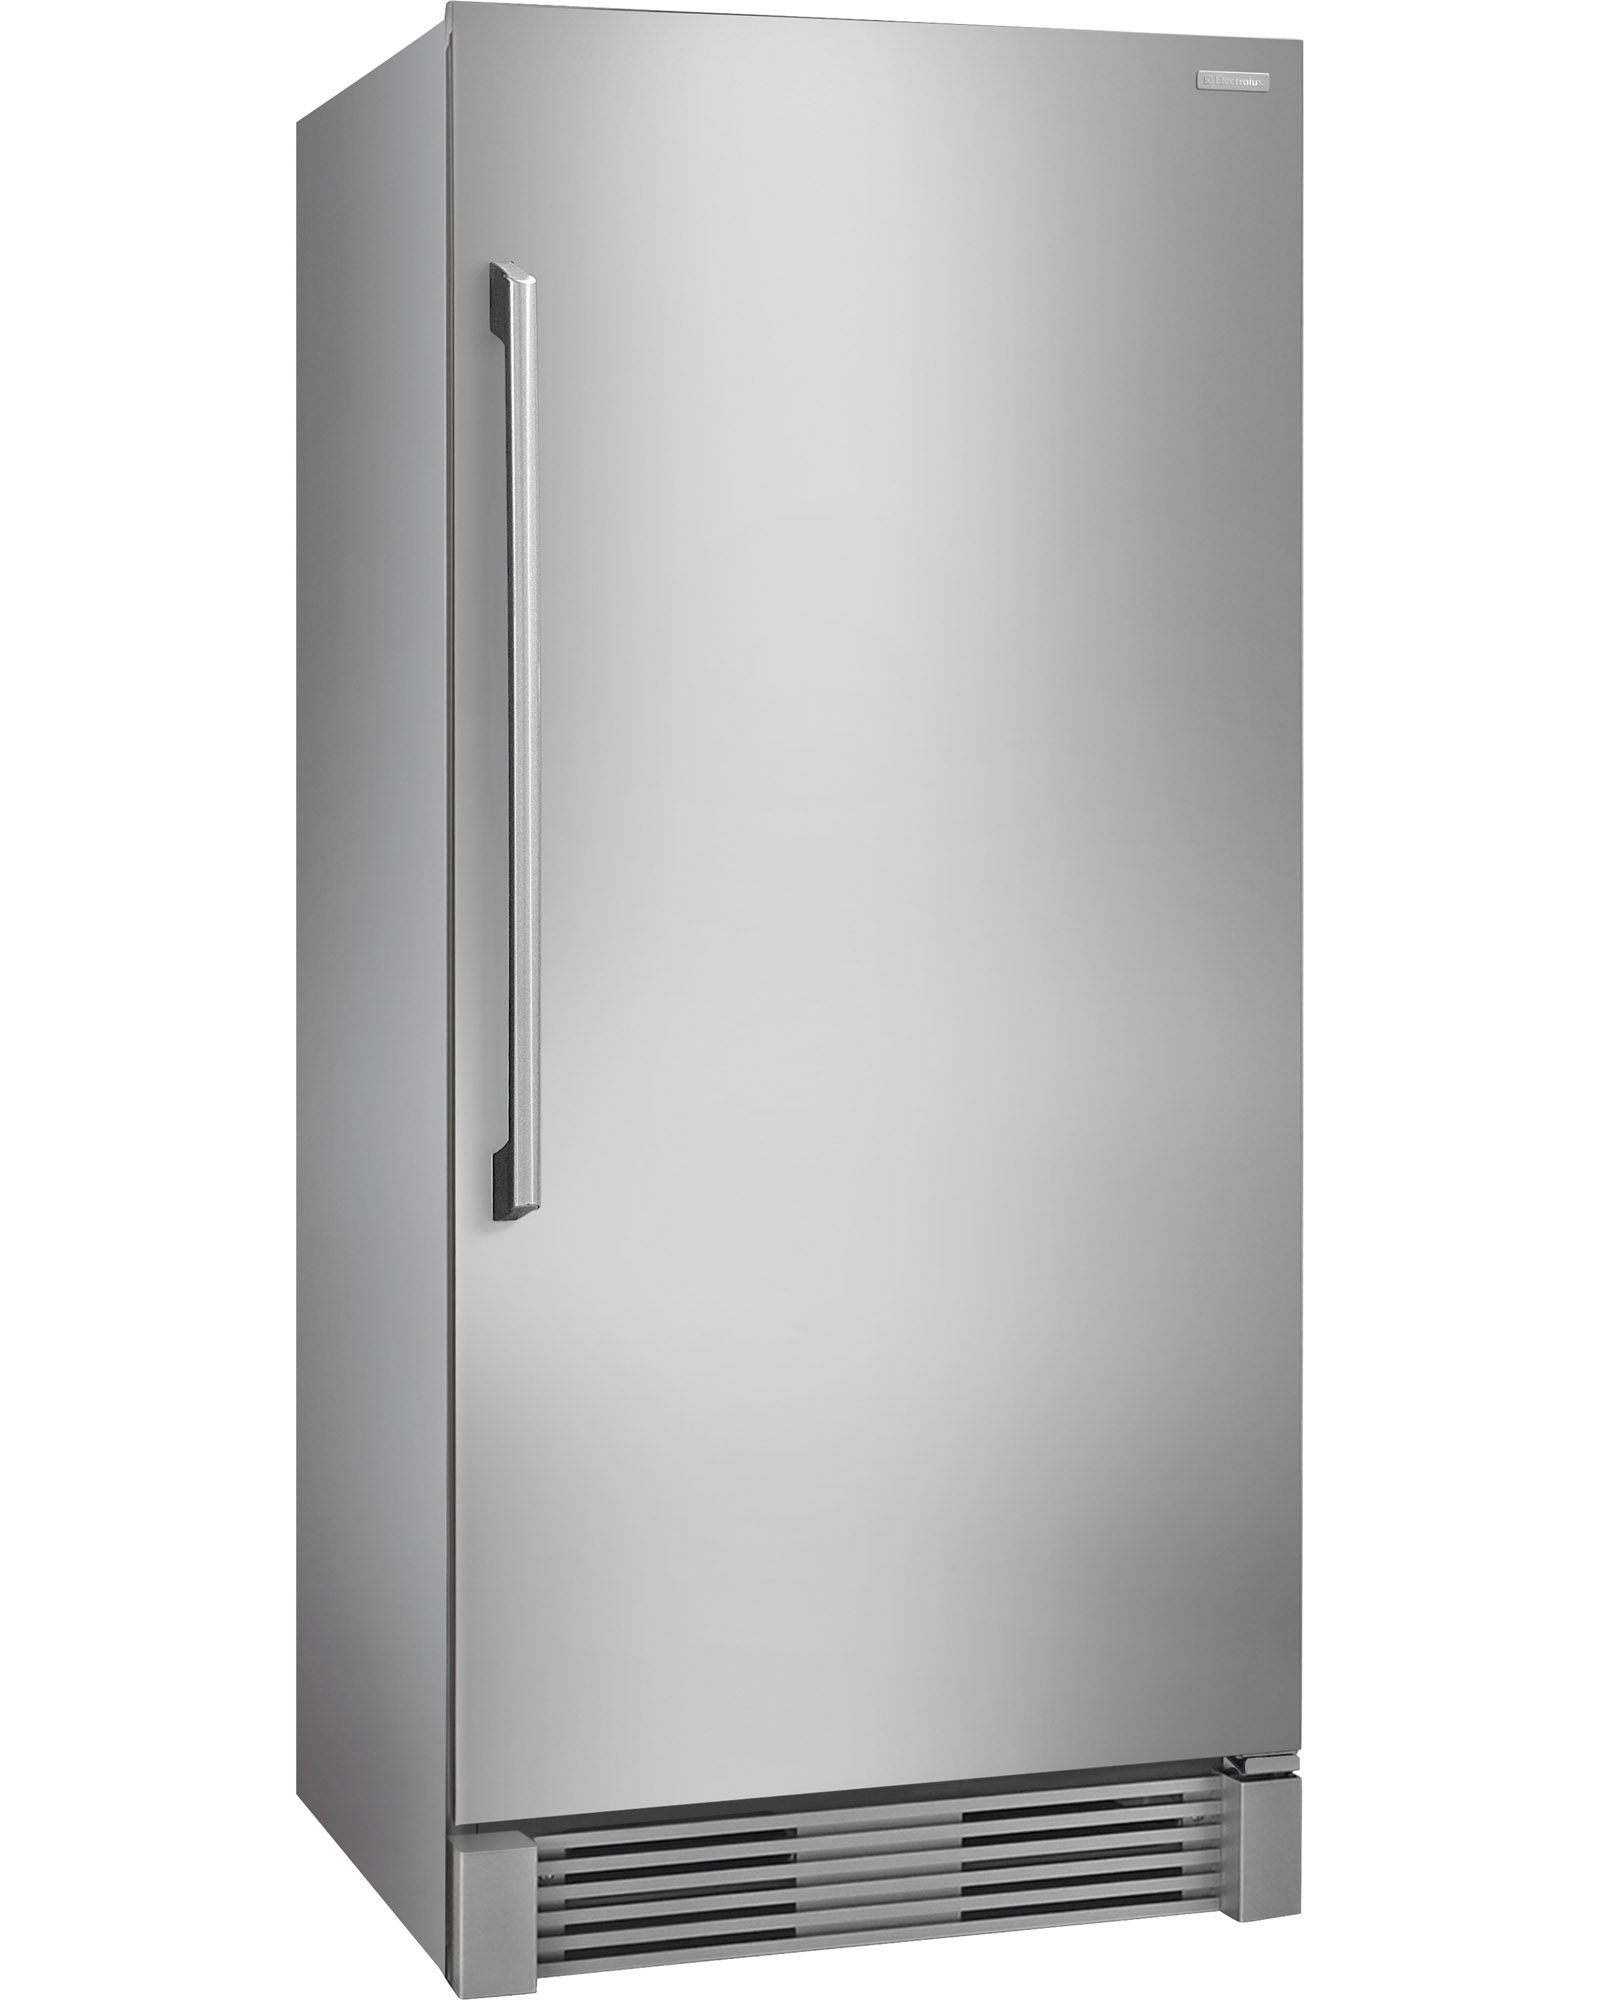 Electrolux EI32AR80QS 18.6 cu. ft. Upright All Refrigerator - Stainless Steel EI32AR80QS